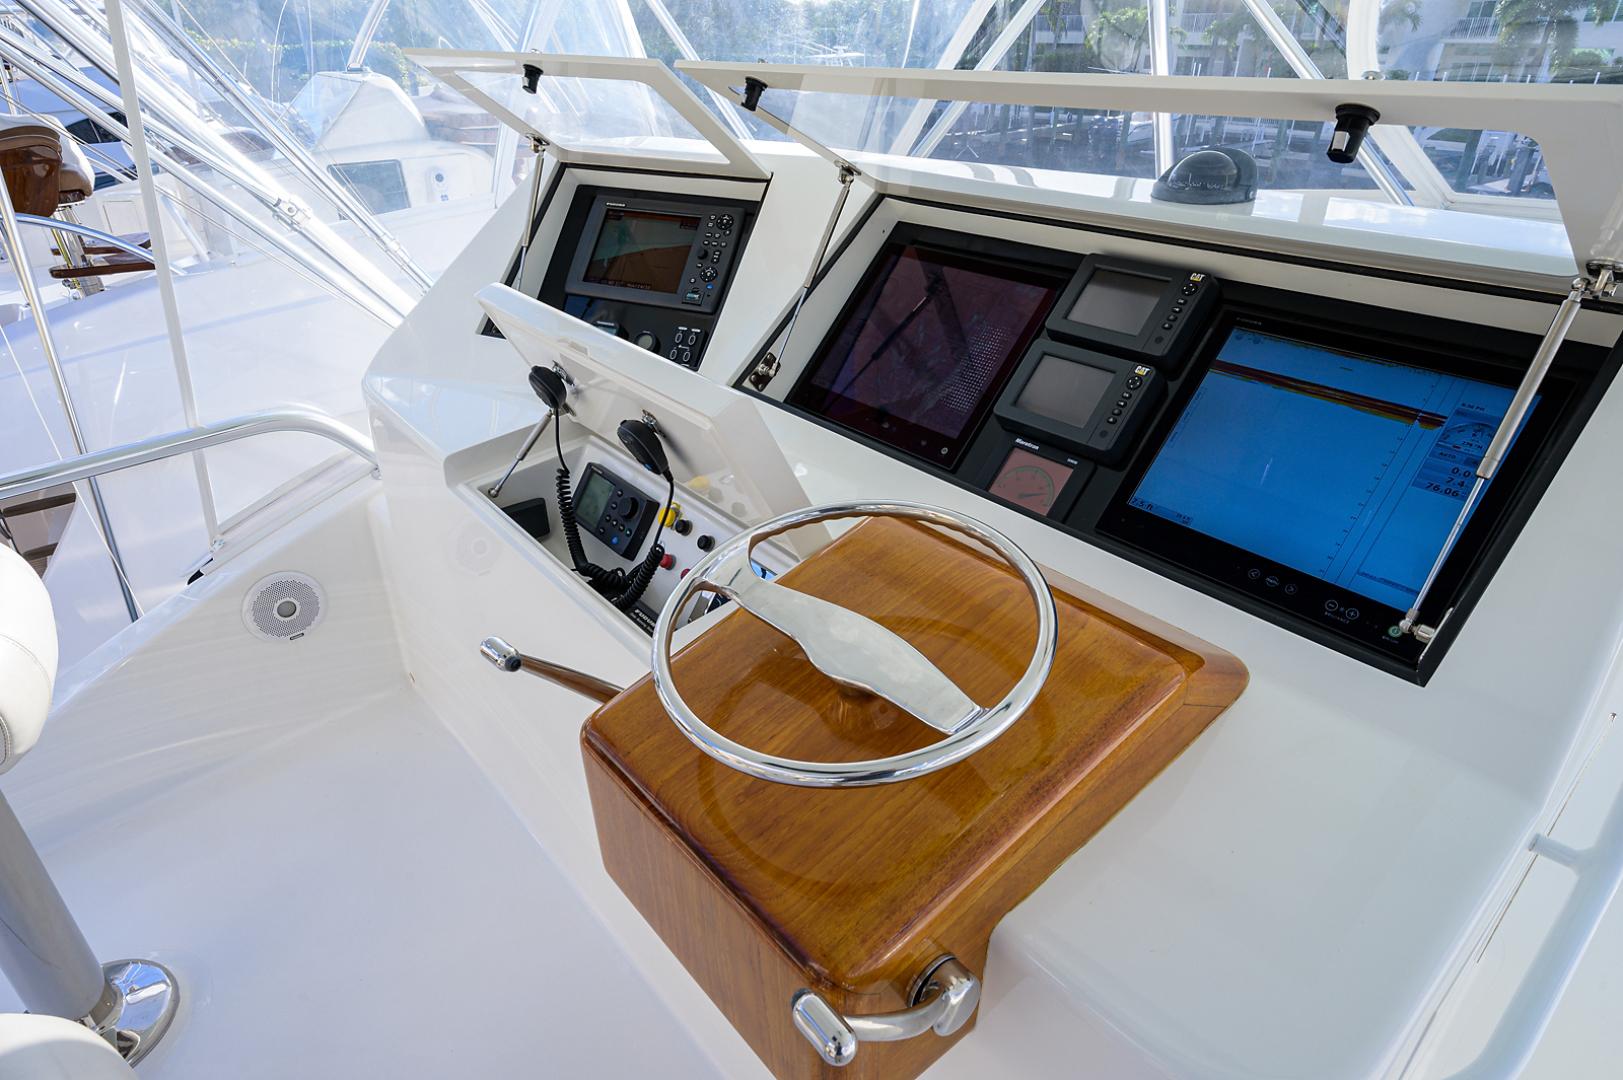 Titan-Convertible 2015-OVER RIDE PALM BEACH GARDENS-Florida-United States-Flybridge-1562362 | Thumbnail